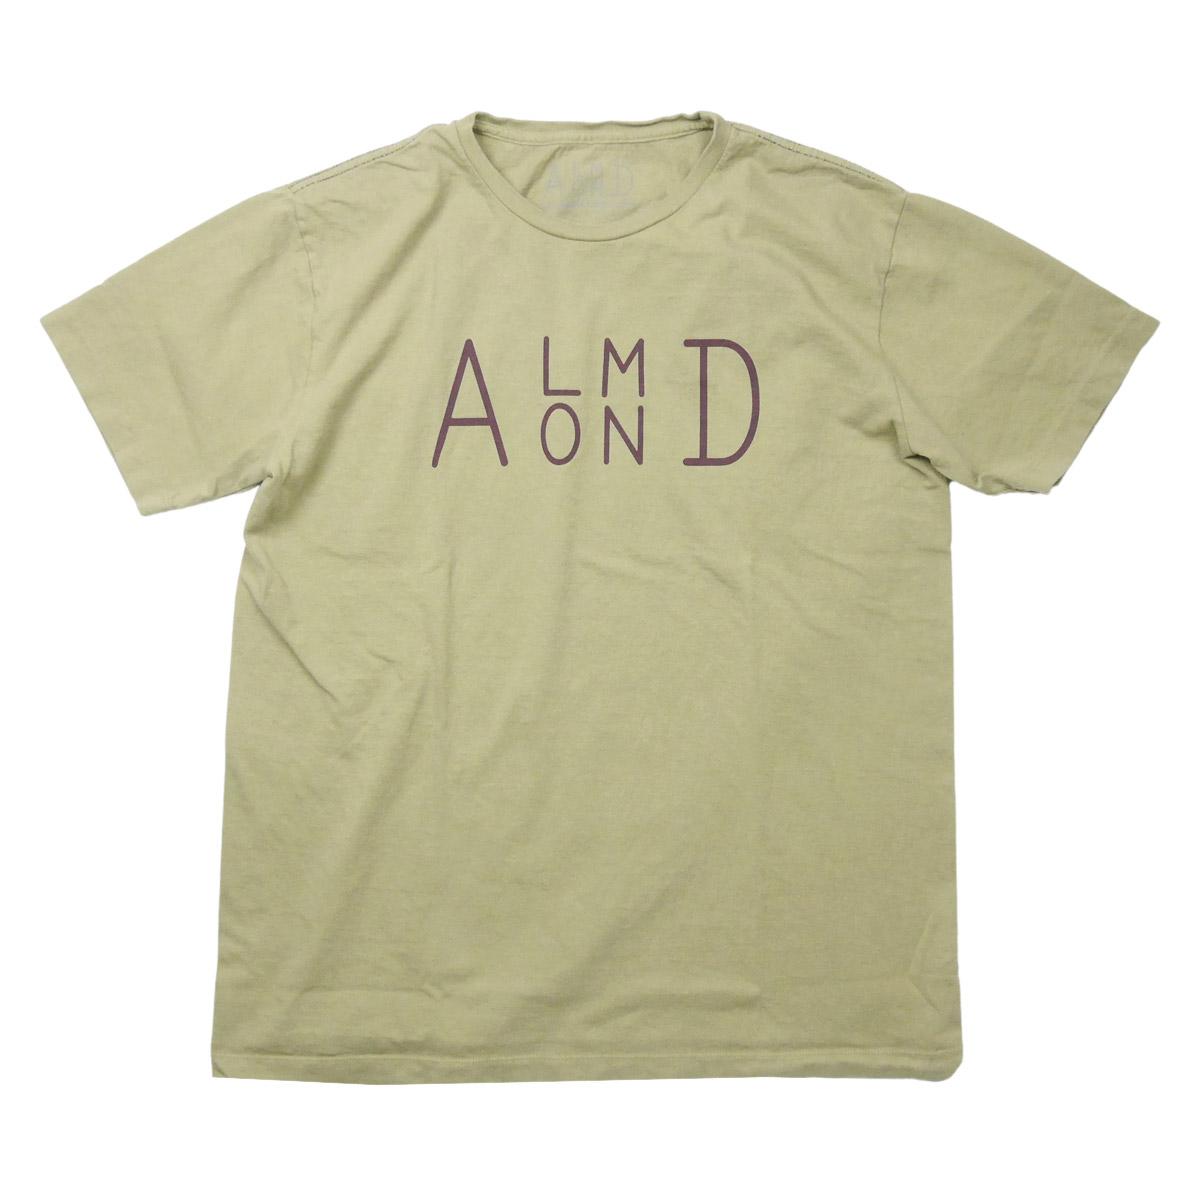 Almond Surf アーモンドサーフボードデザイン SIDESTACK S/S TEE